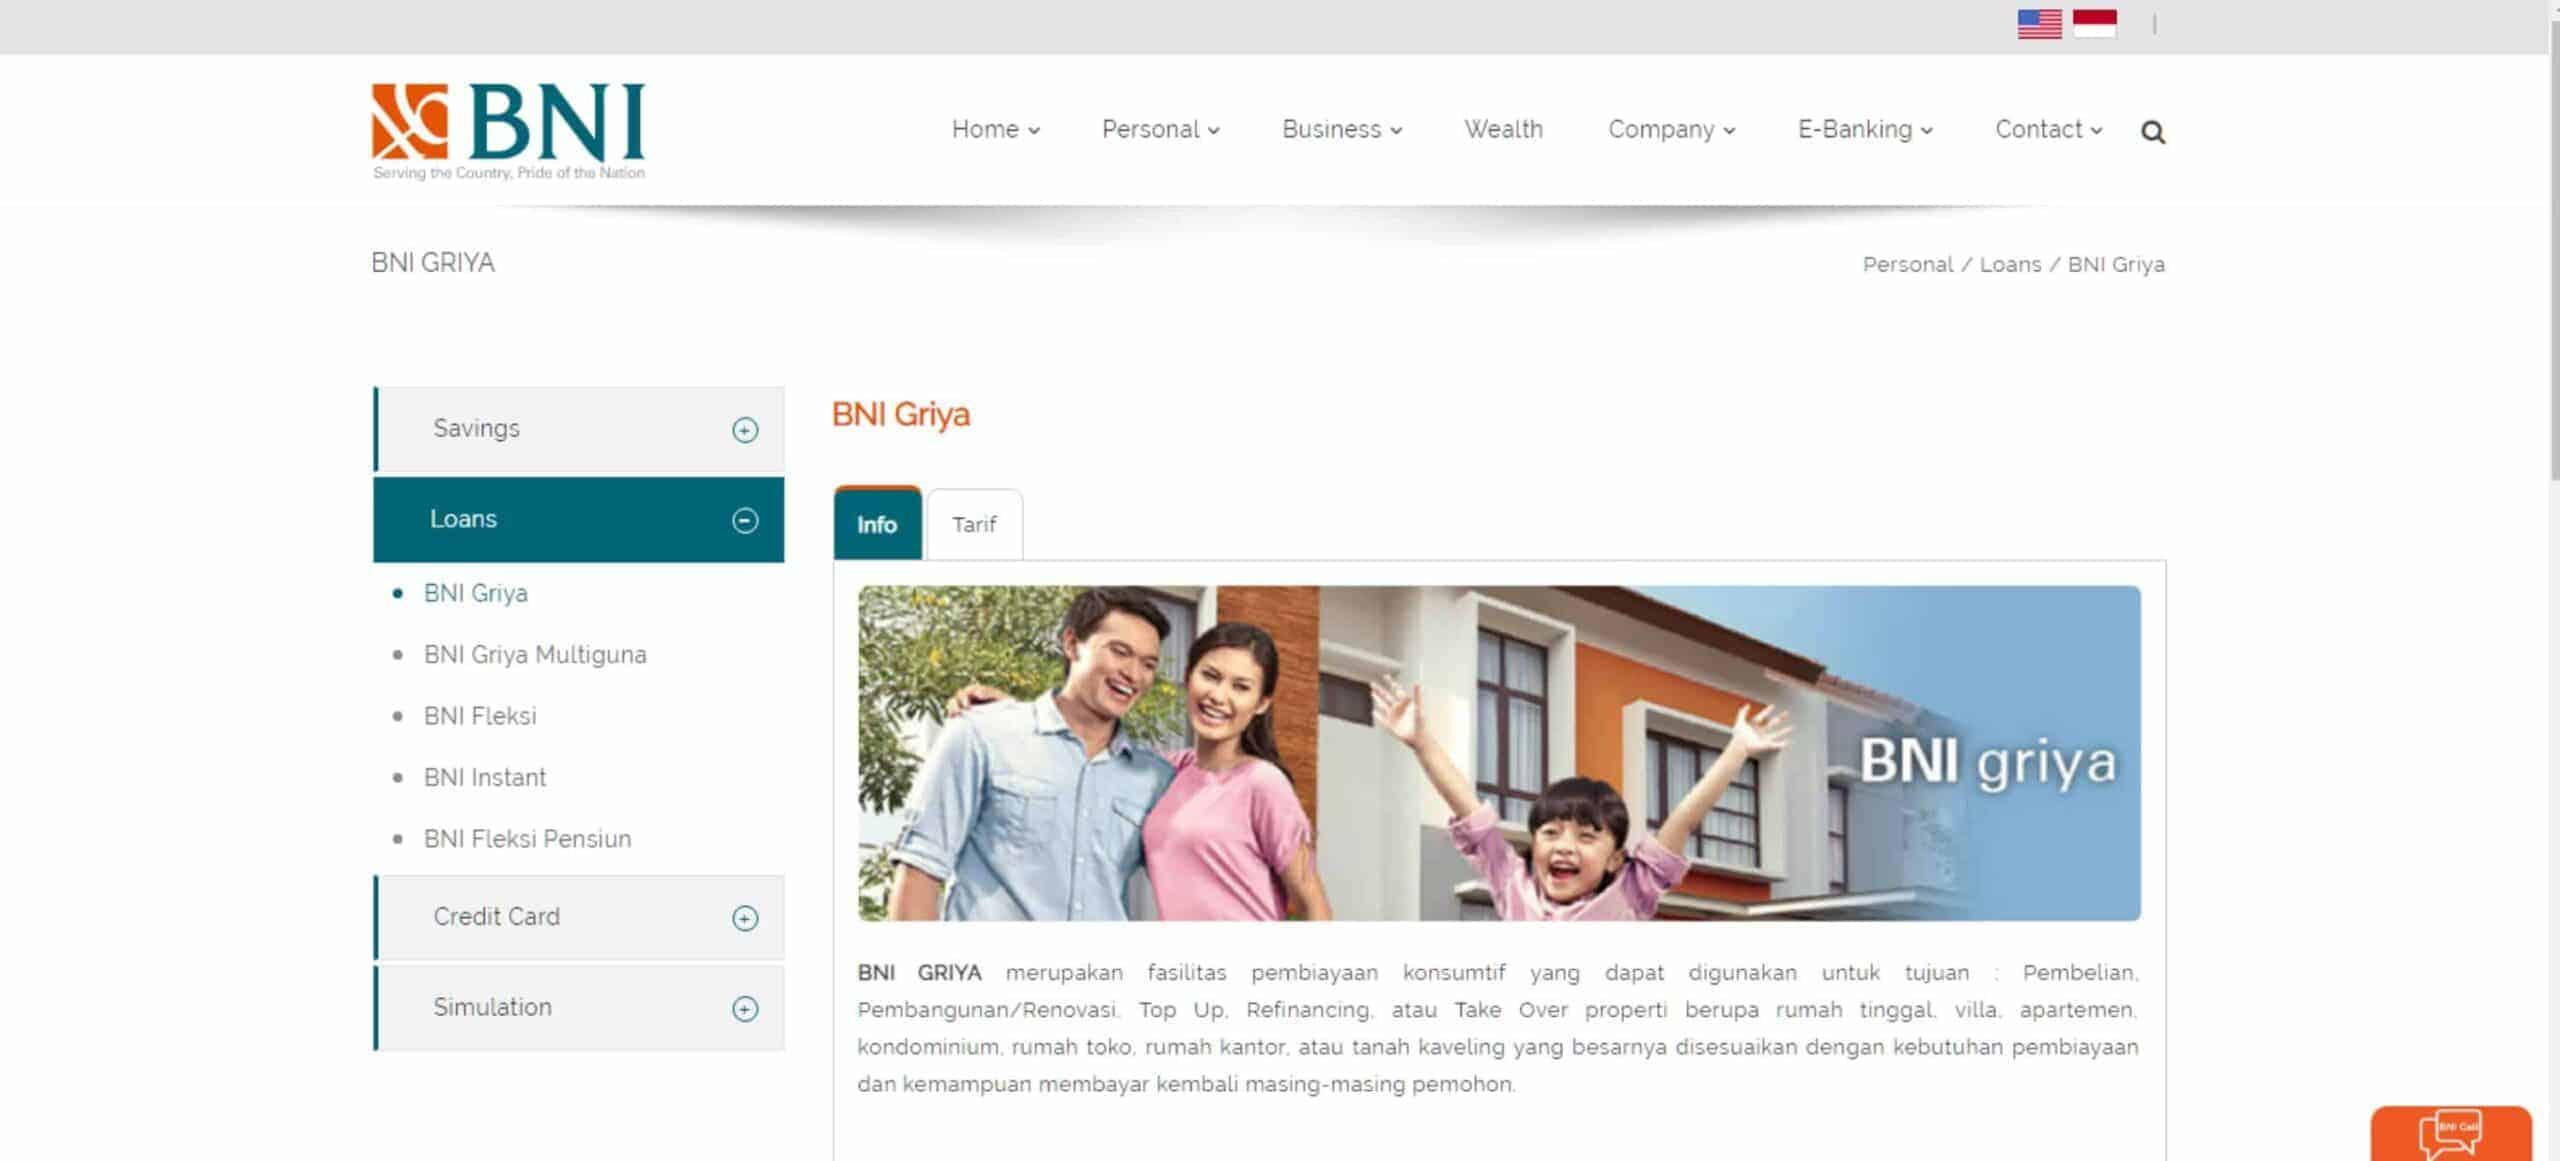 KPR Refinancing BNI